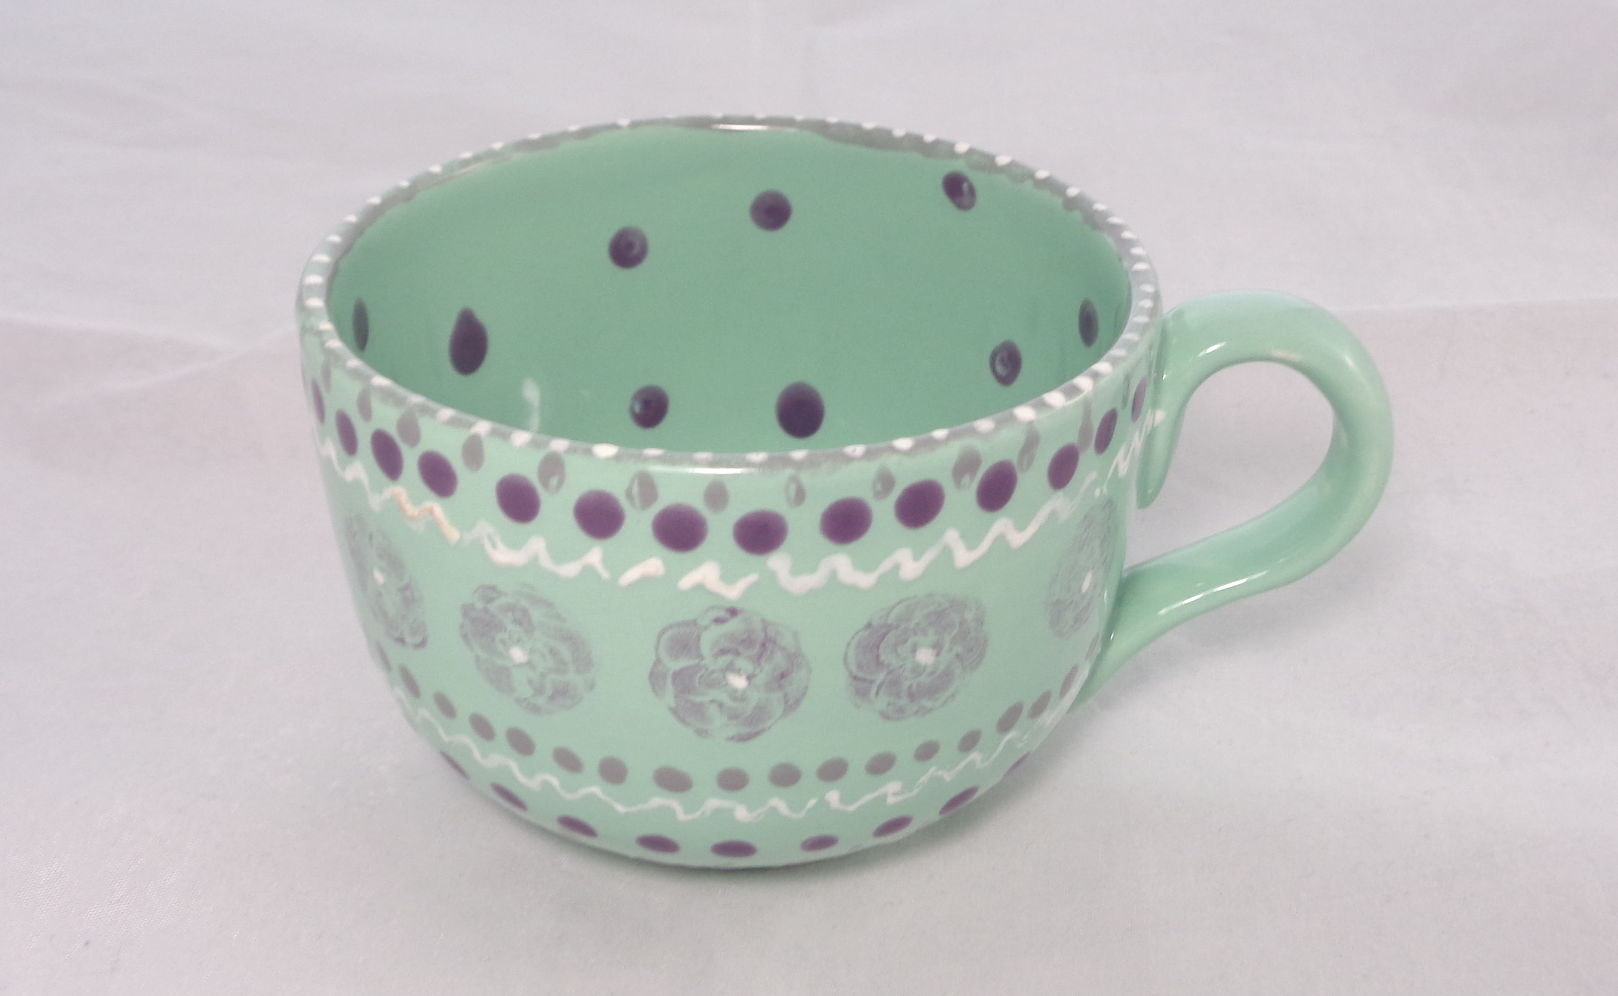 Bemalte Keramik Kaffeetasse Jade